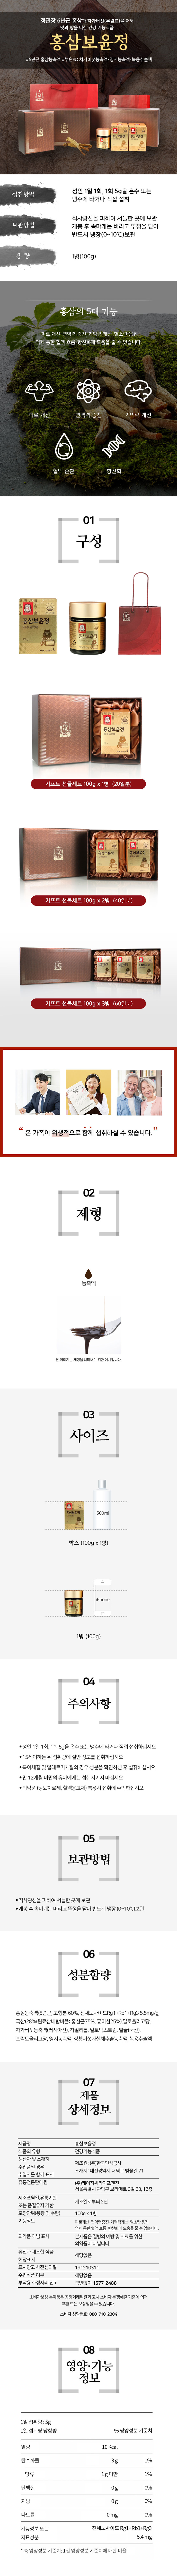 boyoonjung_detail.jpg